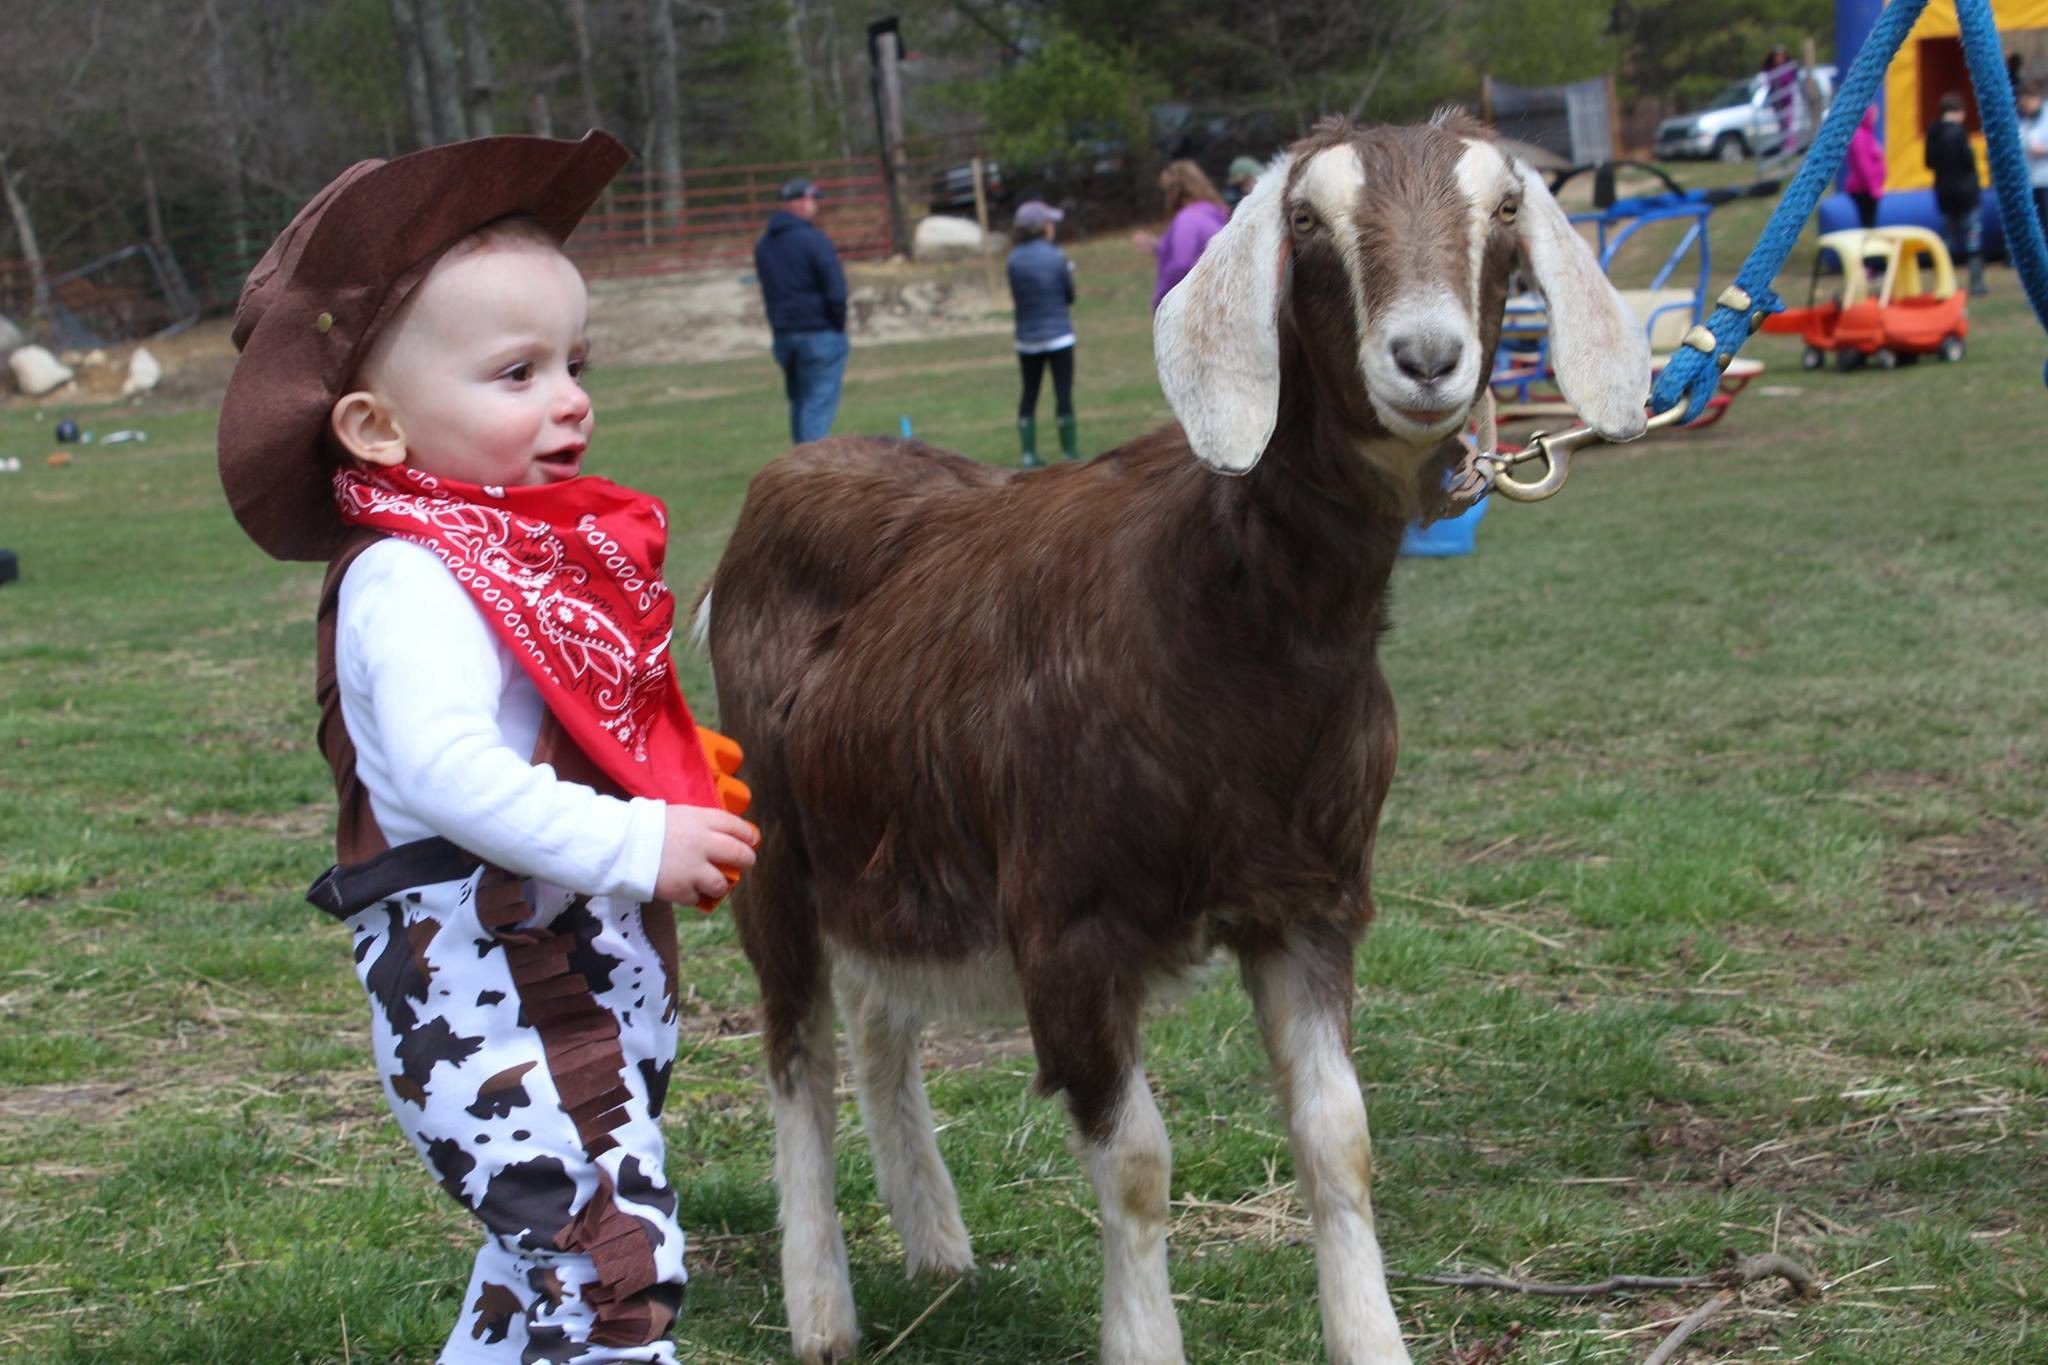 Farm Visit with Pony Rides